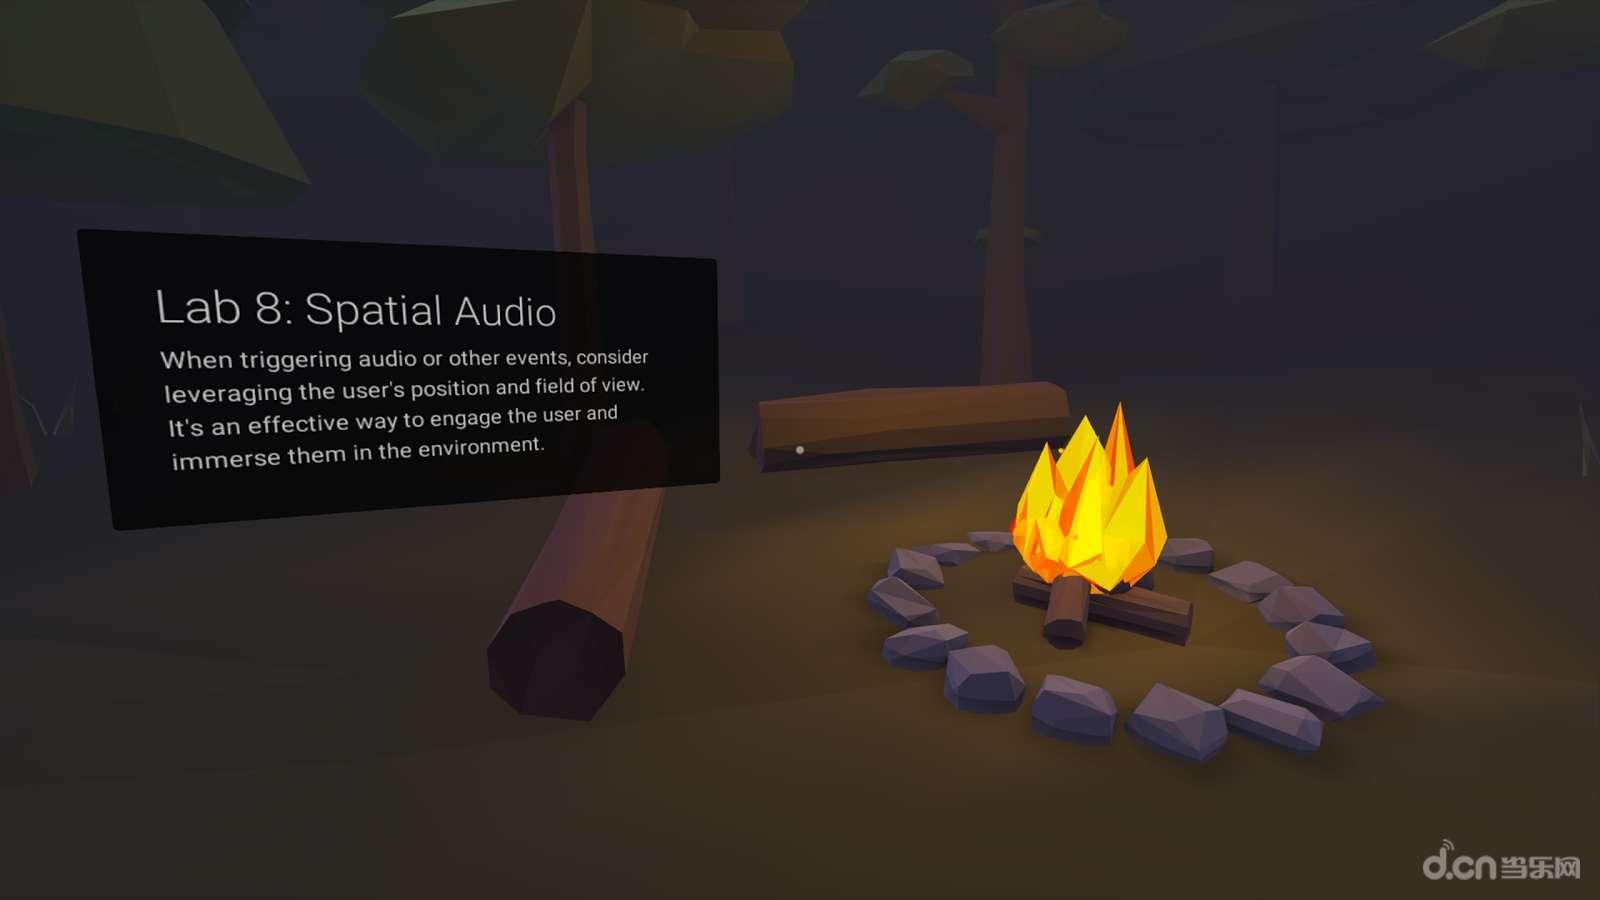 《VR设计实验室 Cardboard Design Lab》是一款虚拟现实VR工具。内容包括十个基本的 VR 设计,例如「使用十字线」、「保持使用者着地」、「光影指导」和「固定视点」,所有课堂都是通过 Cardboard「上课」。 虽然以上的内容仅属基础,不足以让菜鸟变成专家,但也足够新手入门的程度了,而且相关知识也能应用在其他 VR 平台上。